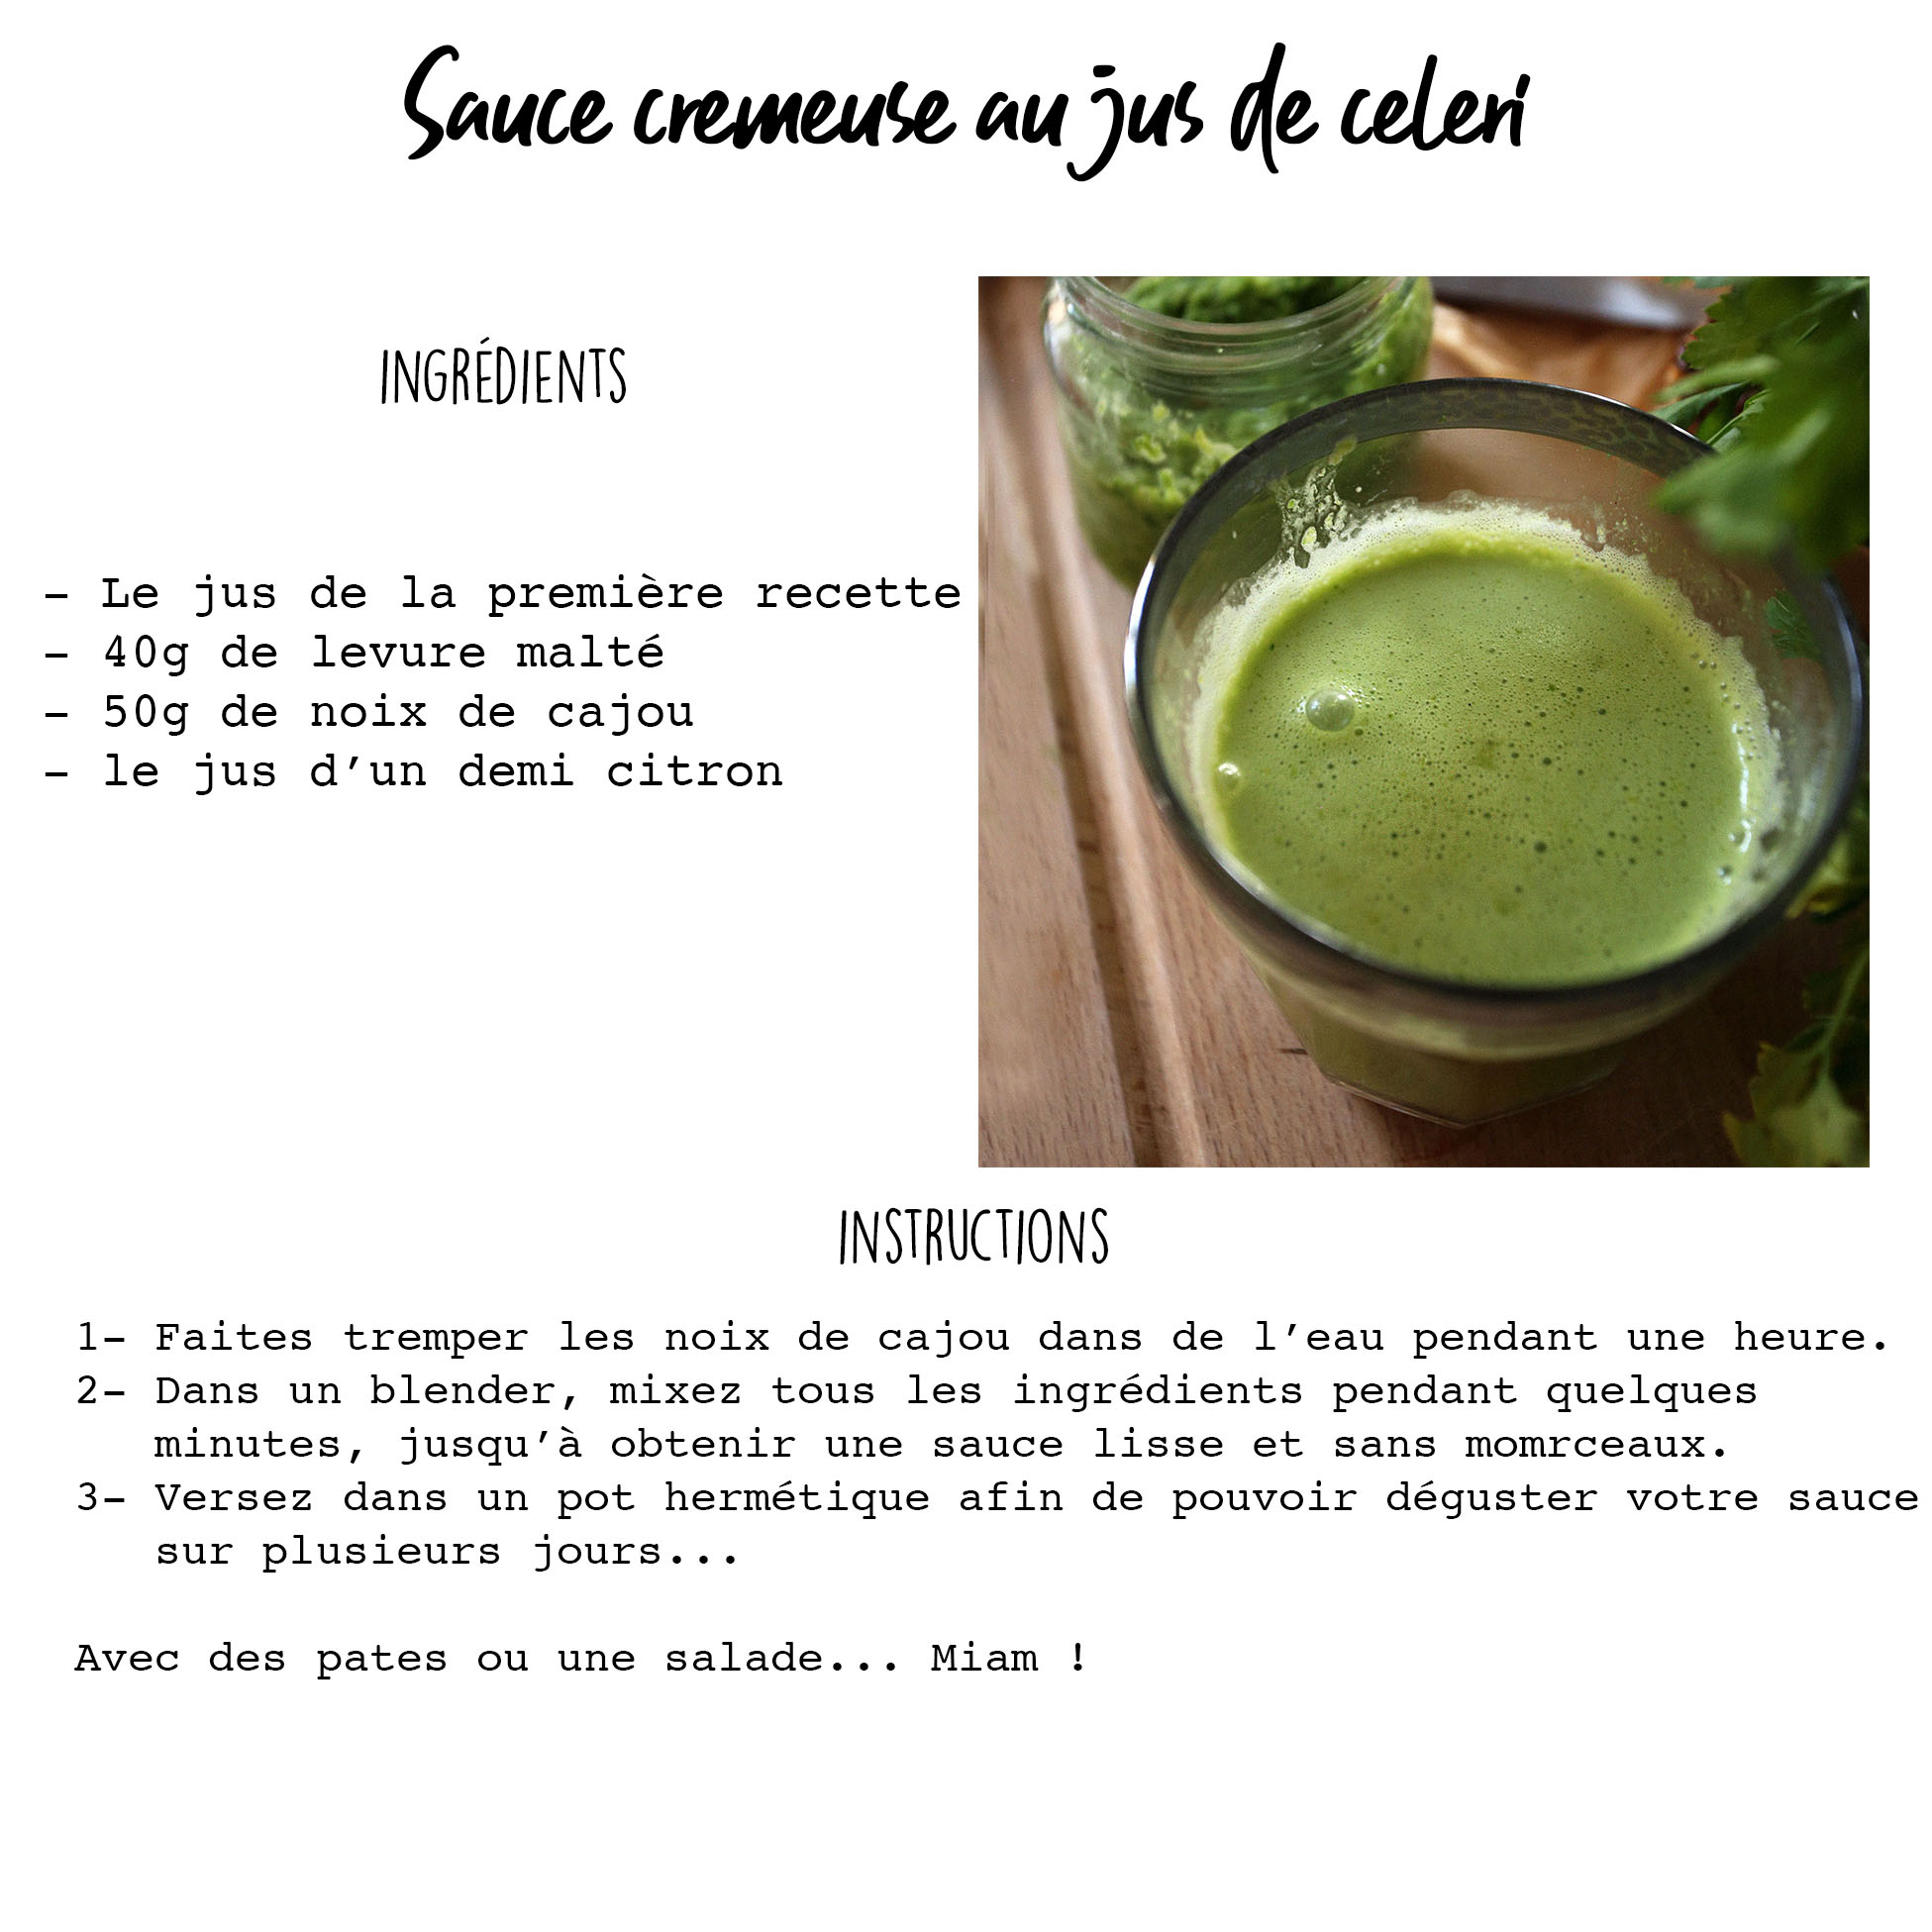 Recette- Sauce crémeuse céleri